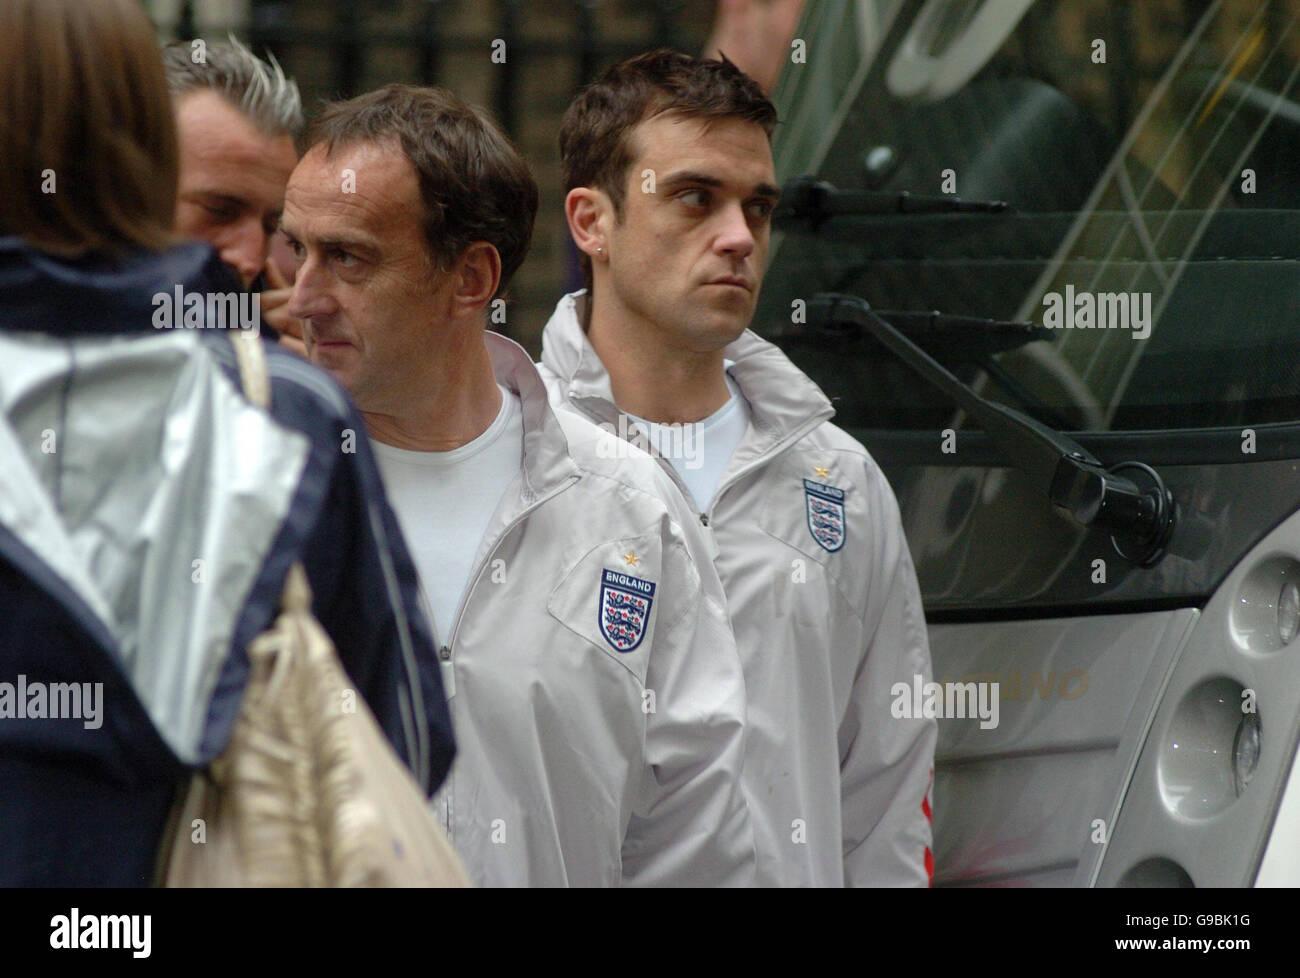 Robbie Williams dirige l'équipe de football de l'Angleterre à l'aide de No 10 Downing Street Photo Stock